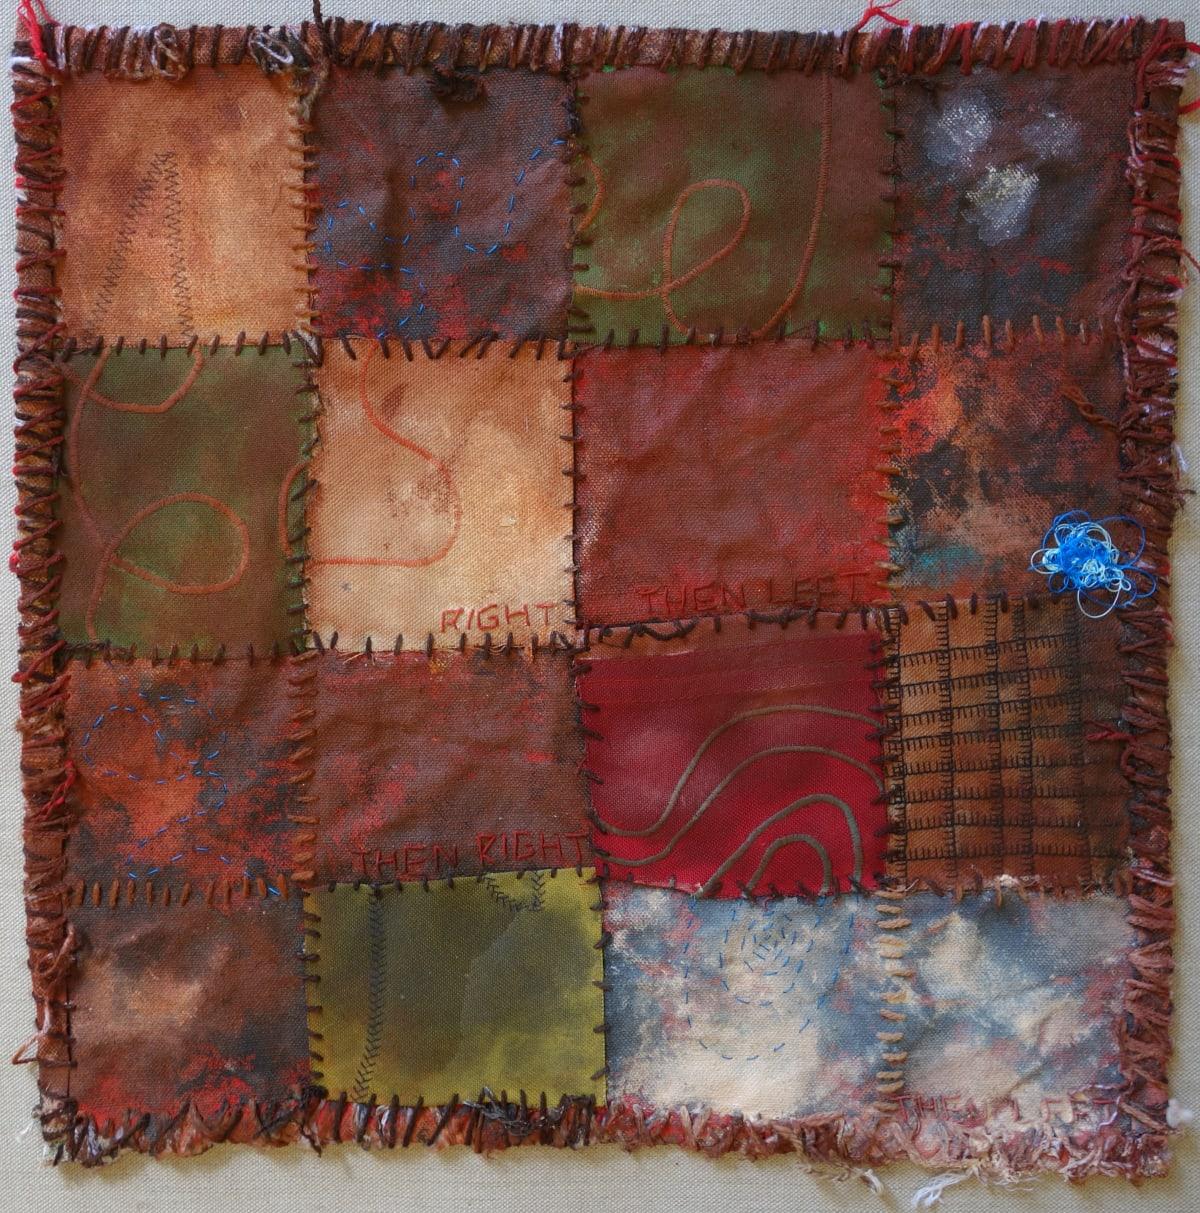 Stephen Eastaugh MUDMAPS 4 (Right then left then right then left) Broome acrylic, thread, linen 45 x 45 cm